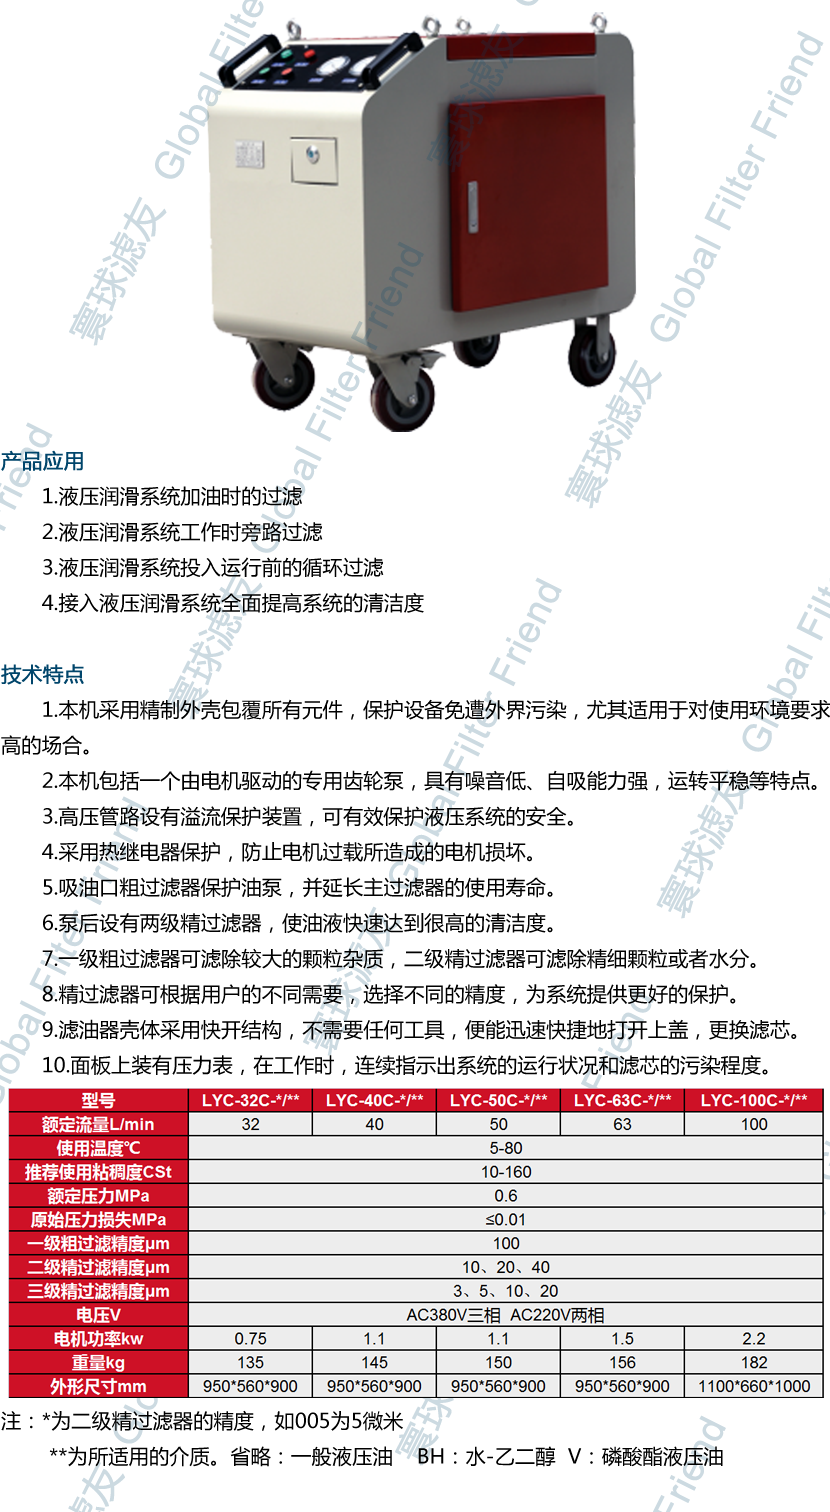 5-4LYC-C系列箱式移动滤油机.png